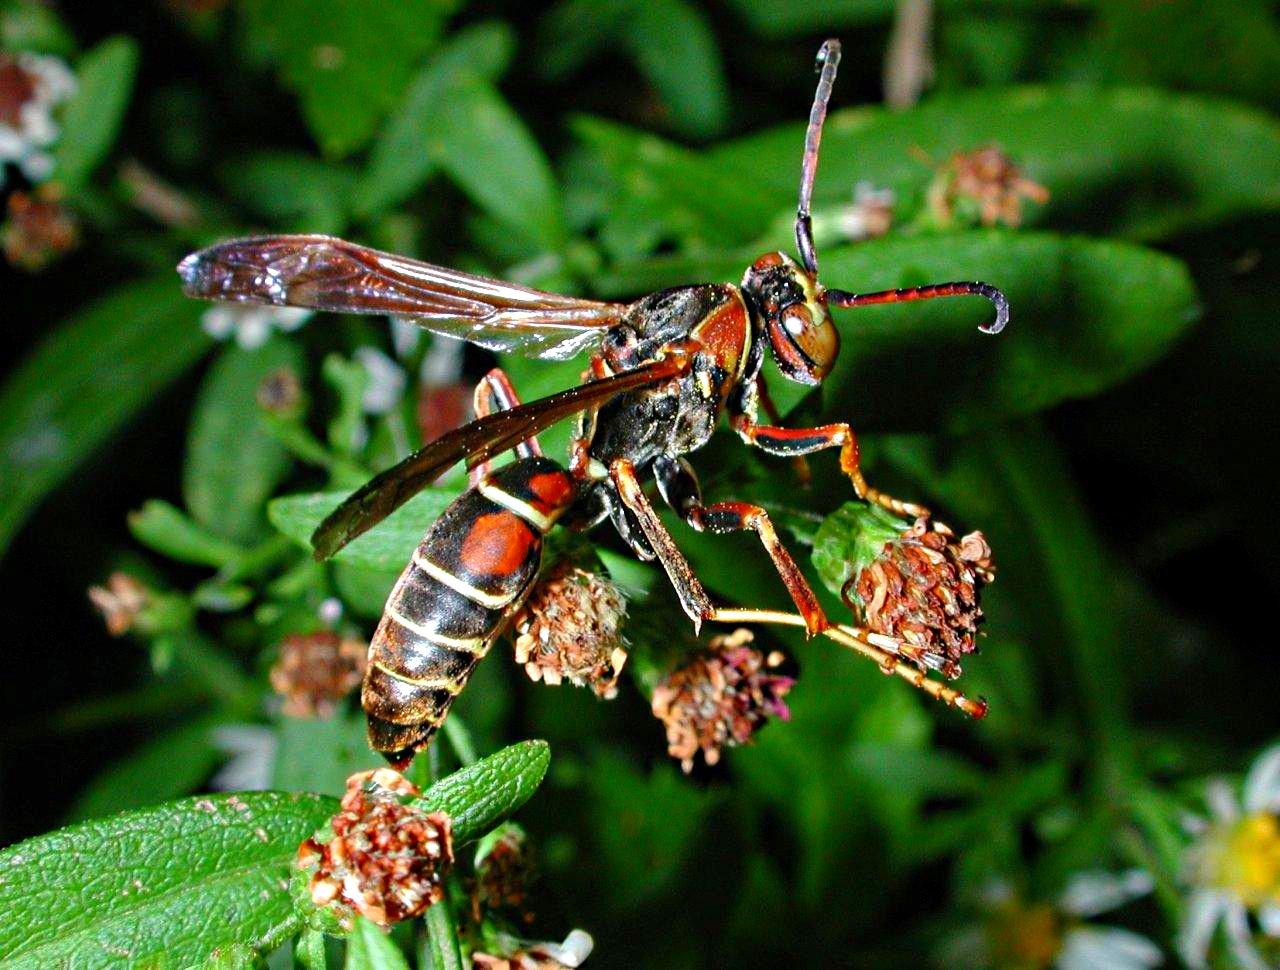 Wasp by Thomas Peace 2013